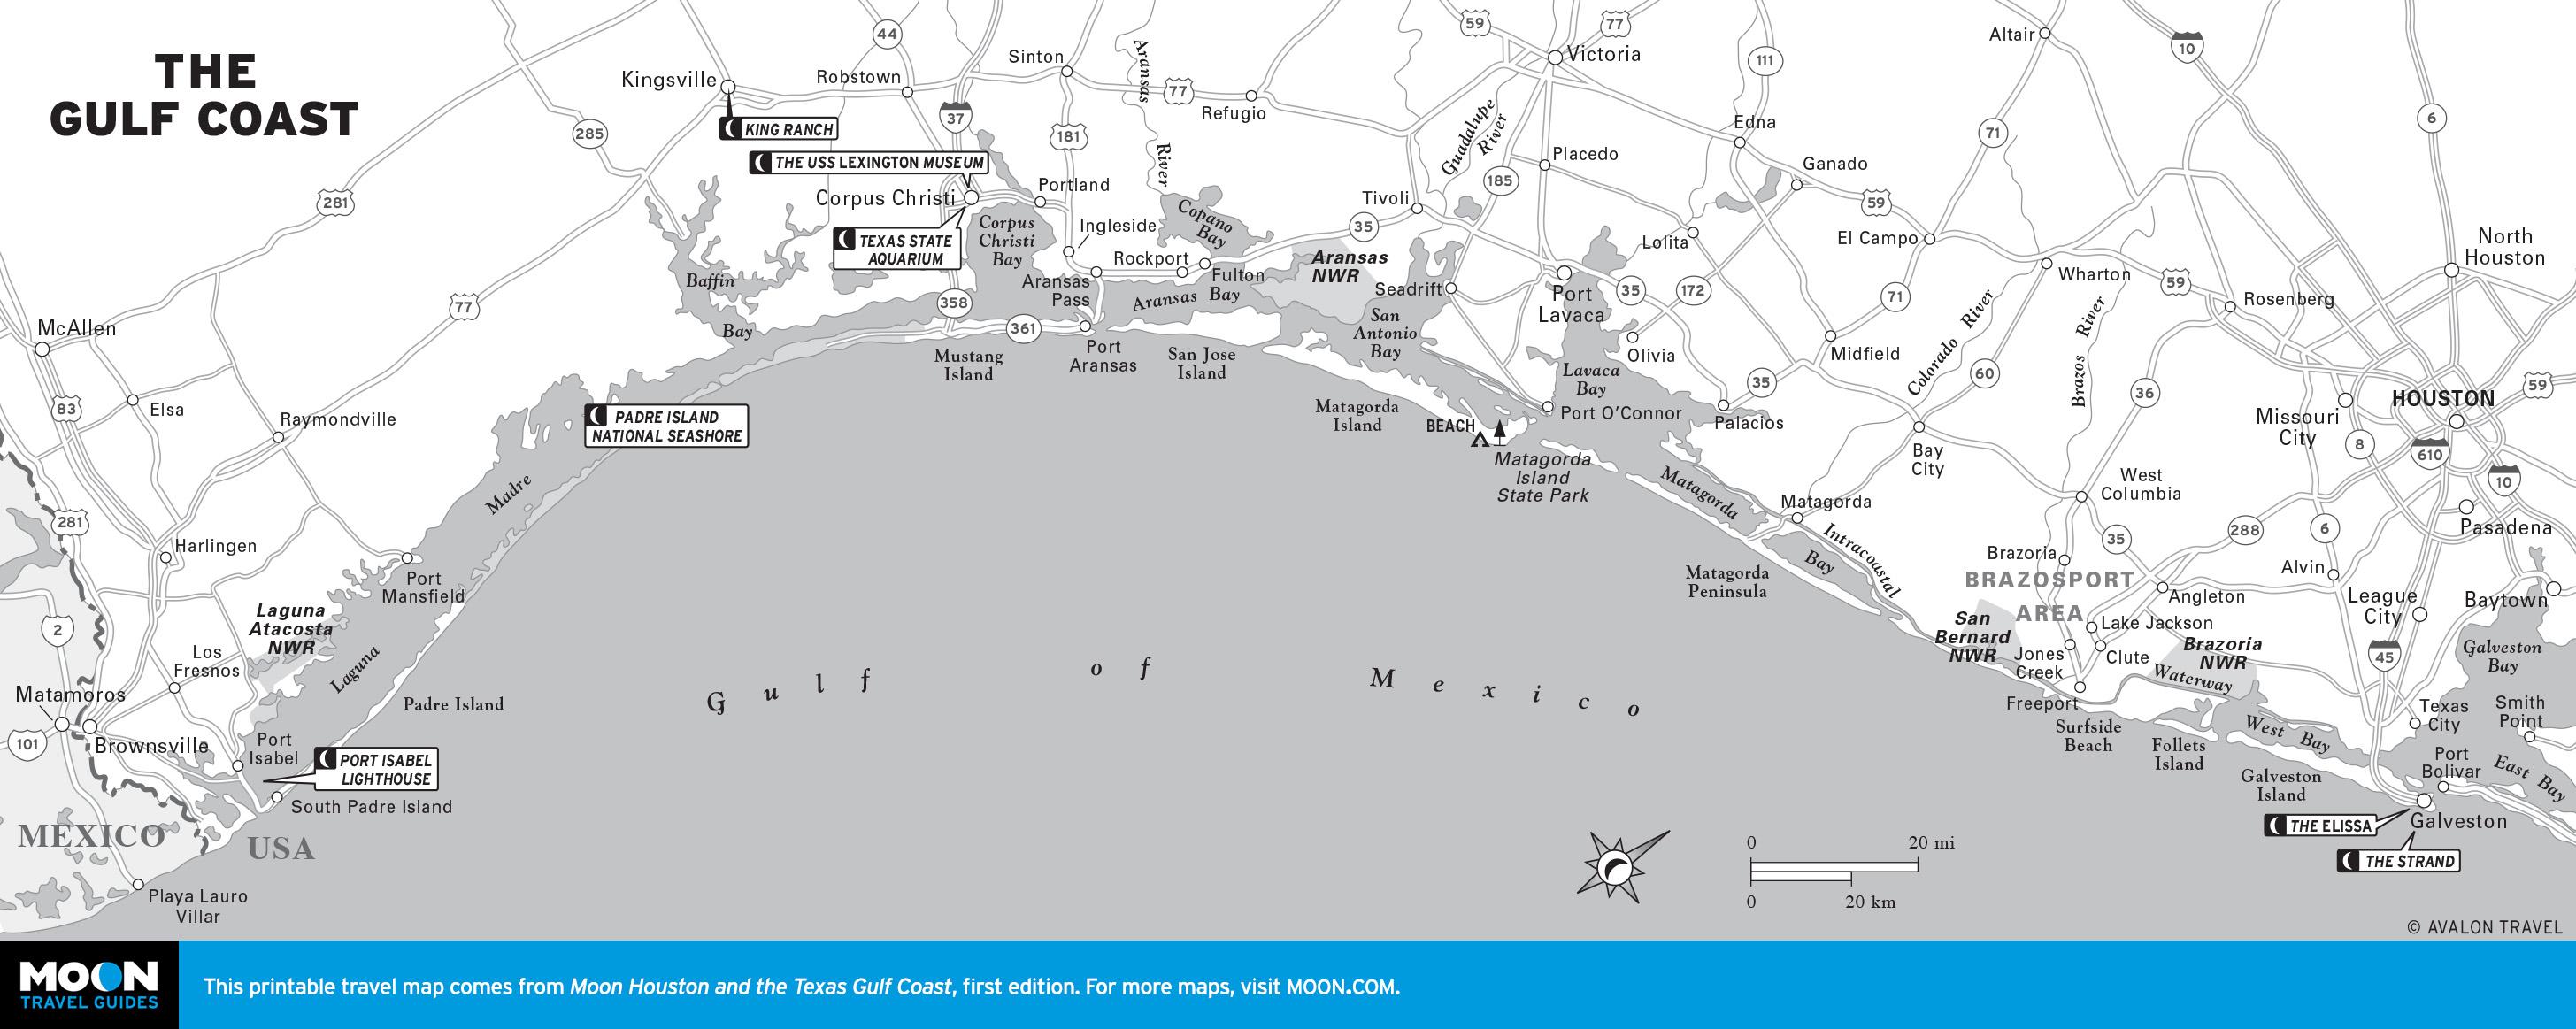 Map Of Texas Gulf Coast Beaches | Business Ideas 2013 - Map Coastal Texas